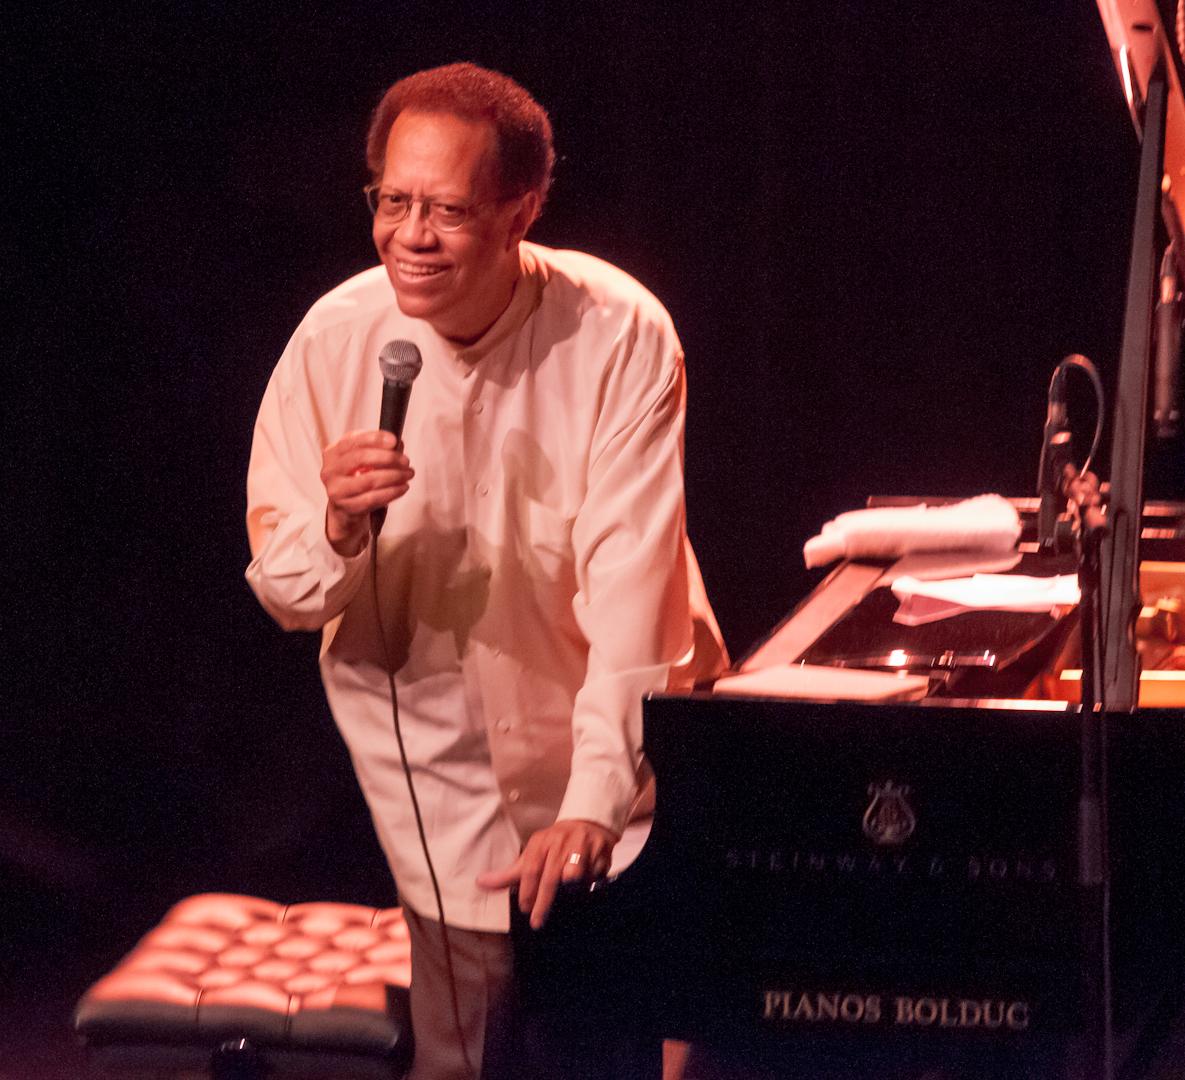 Cedar Walton at the Montreal International Jazz Festival 2012